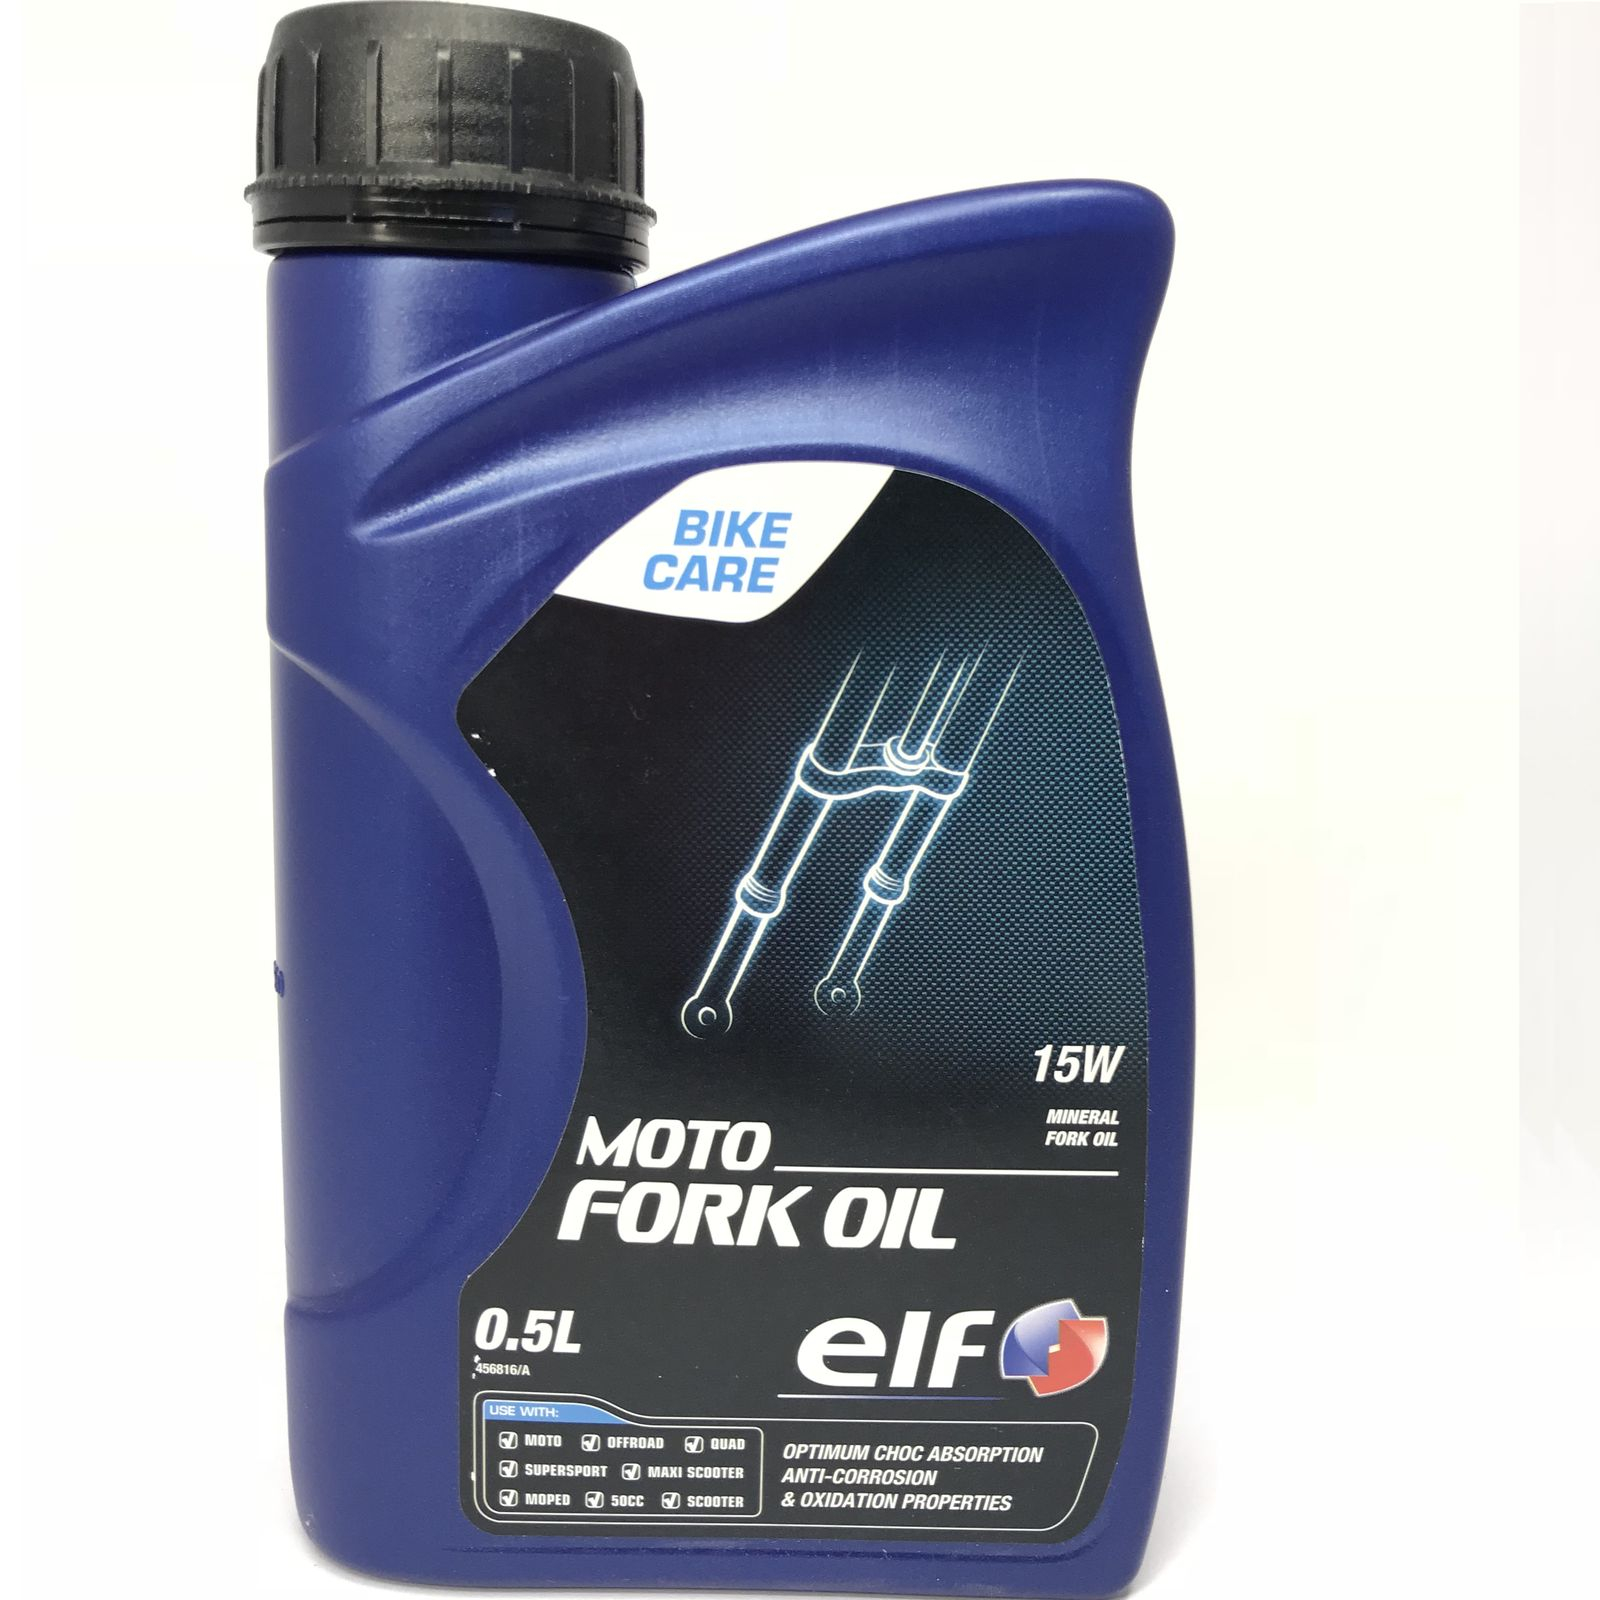 0,5 Liter elf MOTO FORK OIL 15W Gabelöl